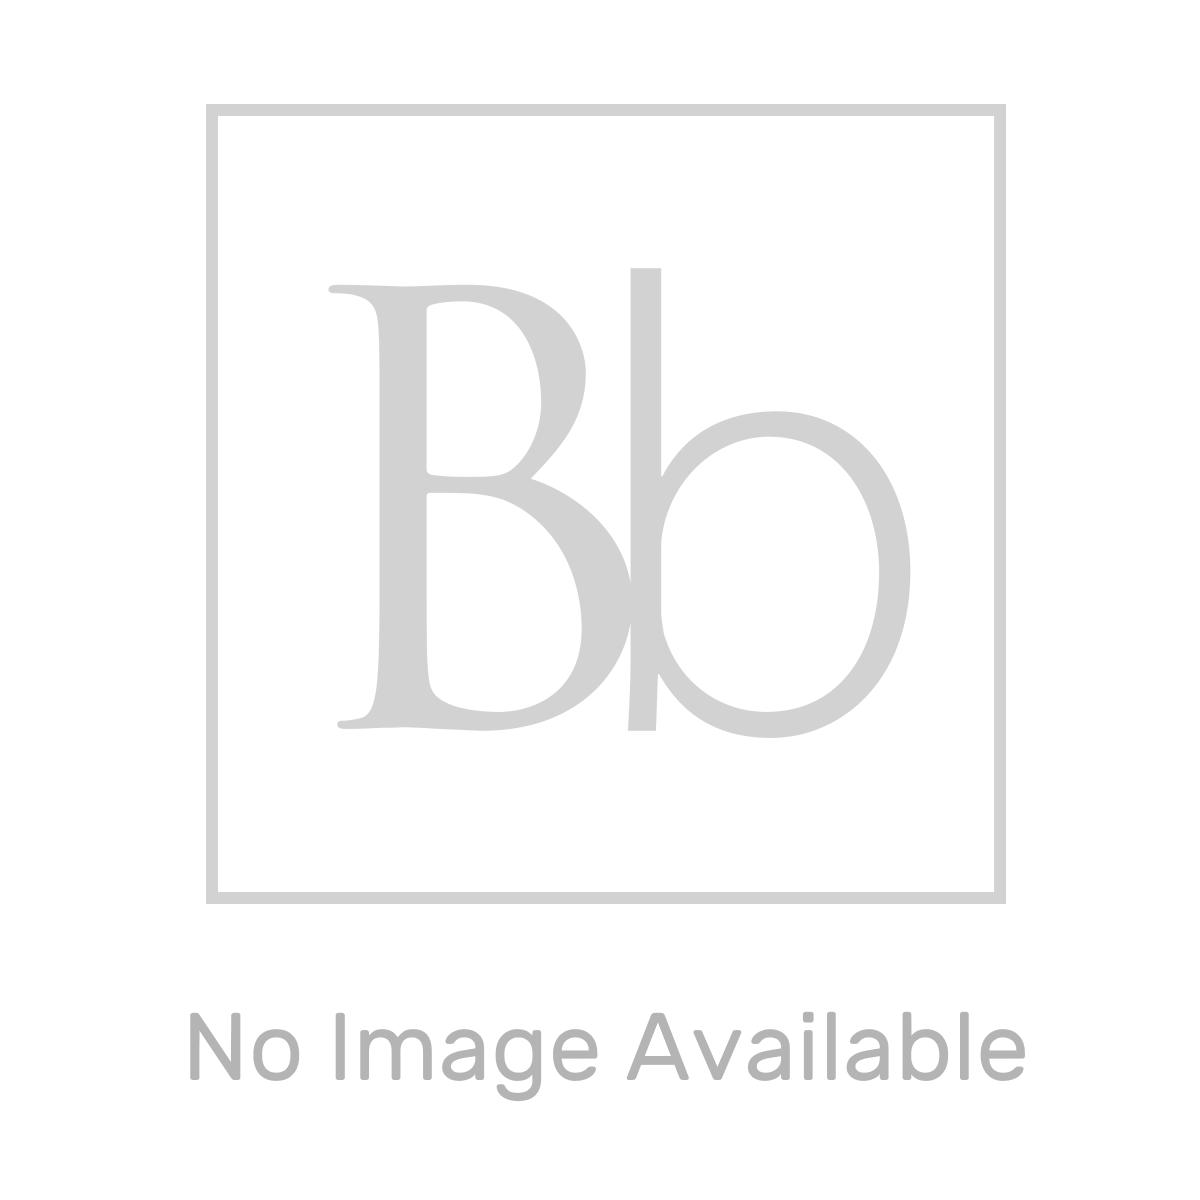 RAK Hermes Heated Bathroom Bluetooth Mirror with Lights and Shaver Socket 600 x 800